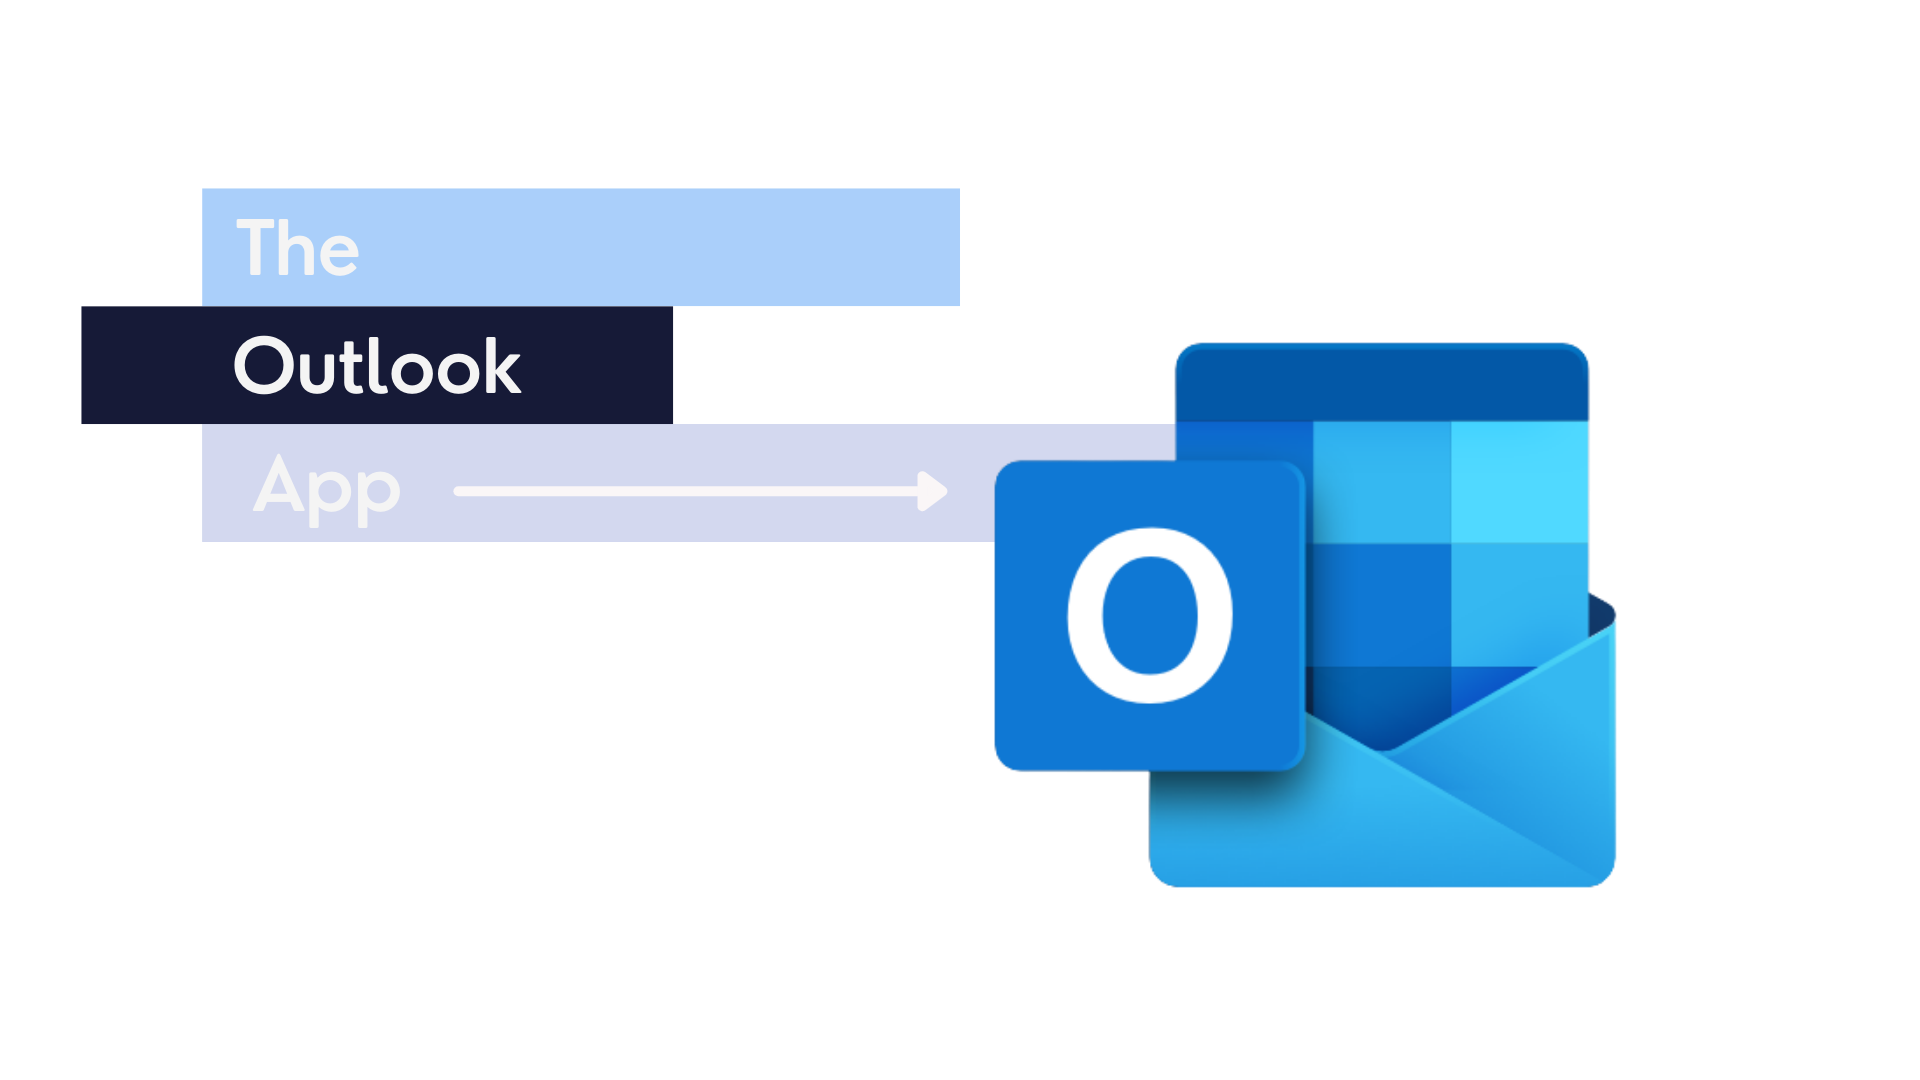 Outlook app logo